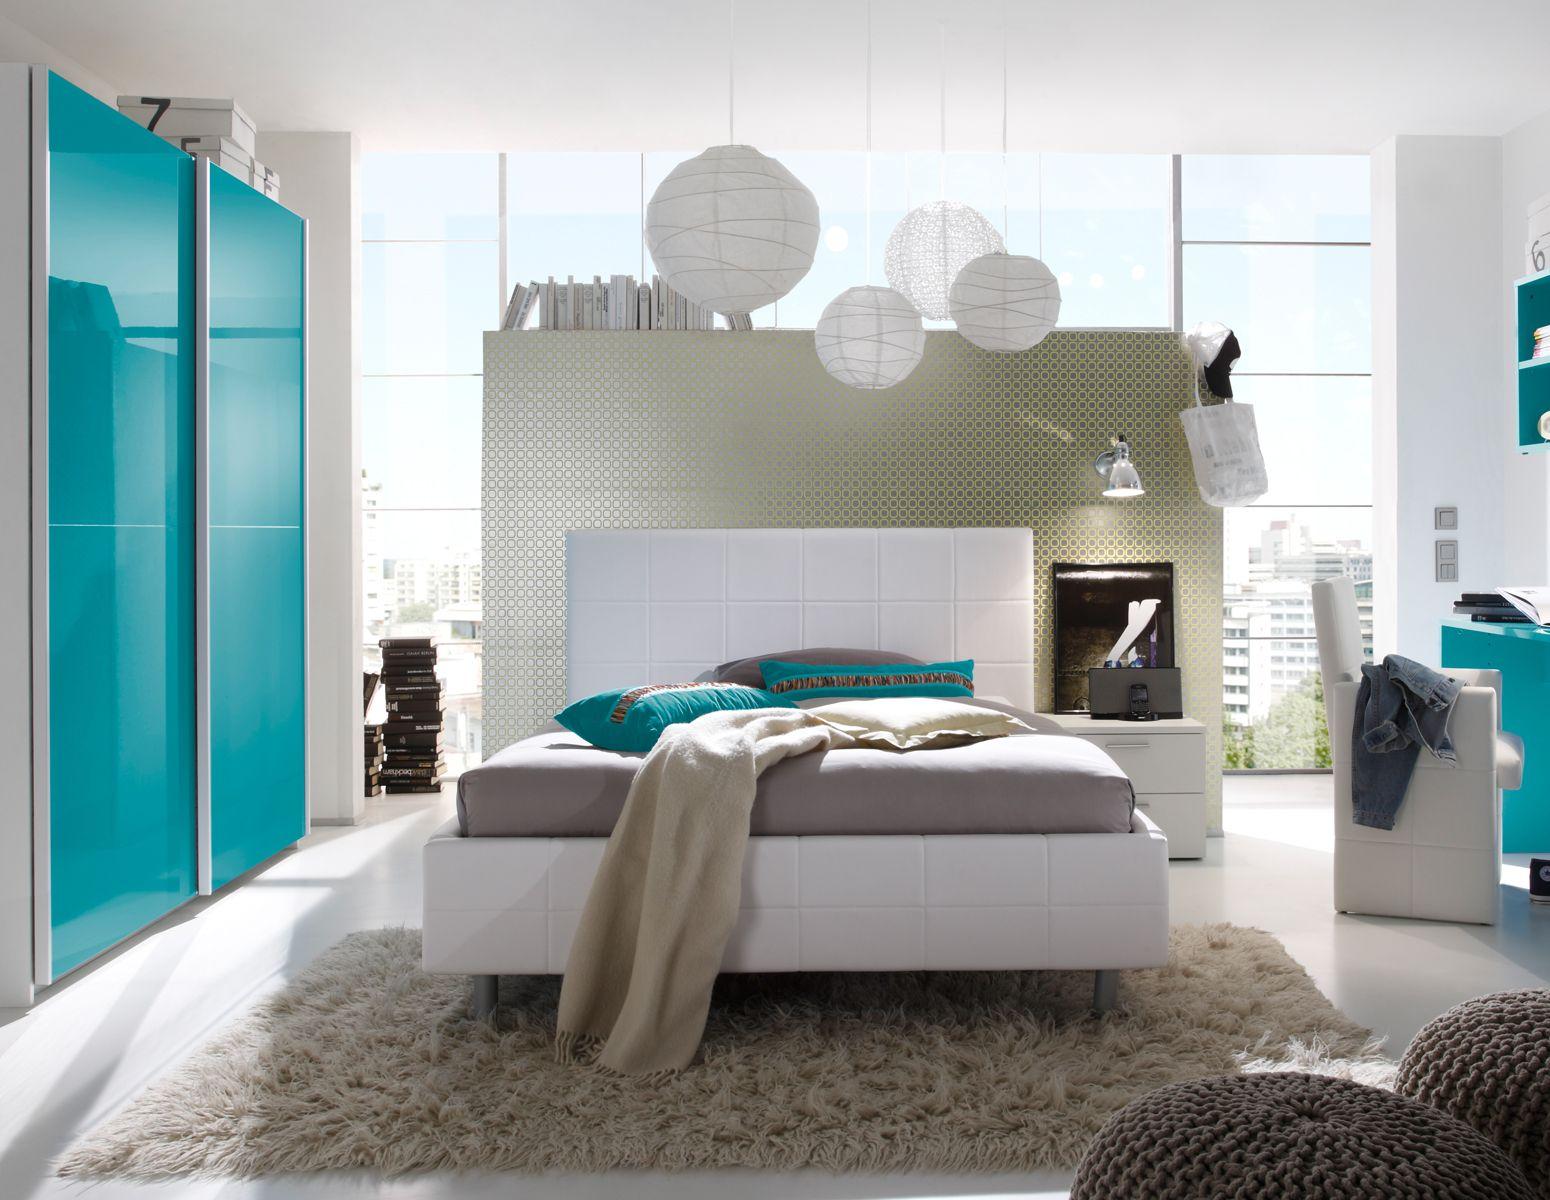 Moderne Polsterbetten das moderne polsterbett smart ist ein echter blickfang für jedes